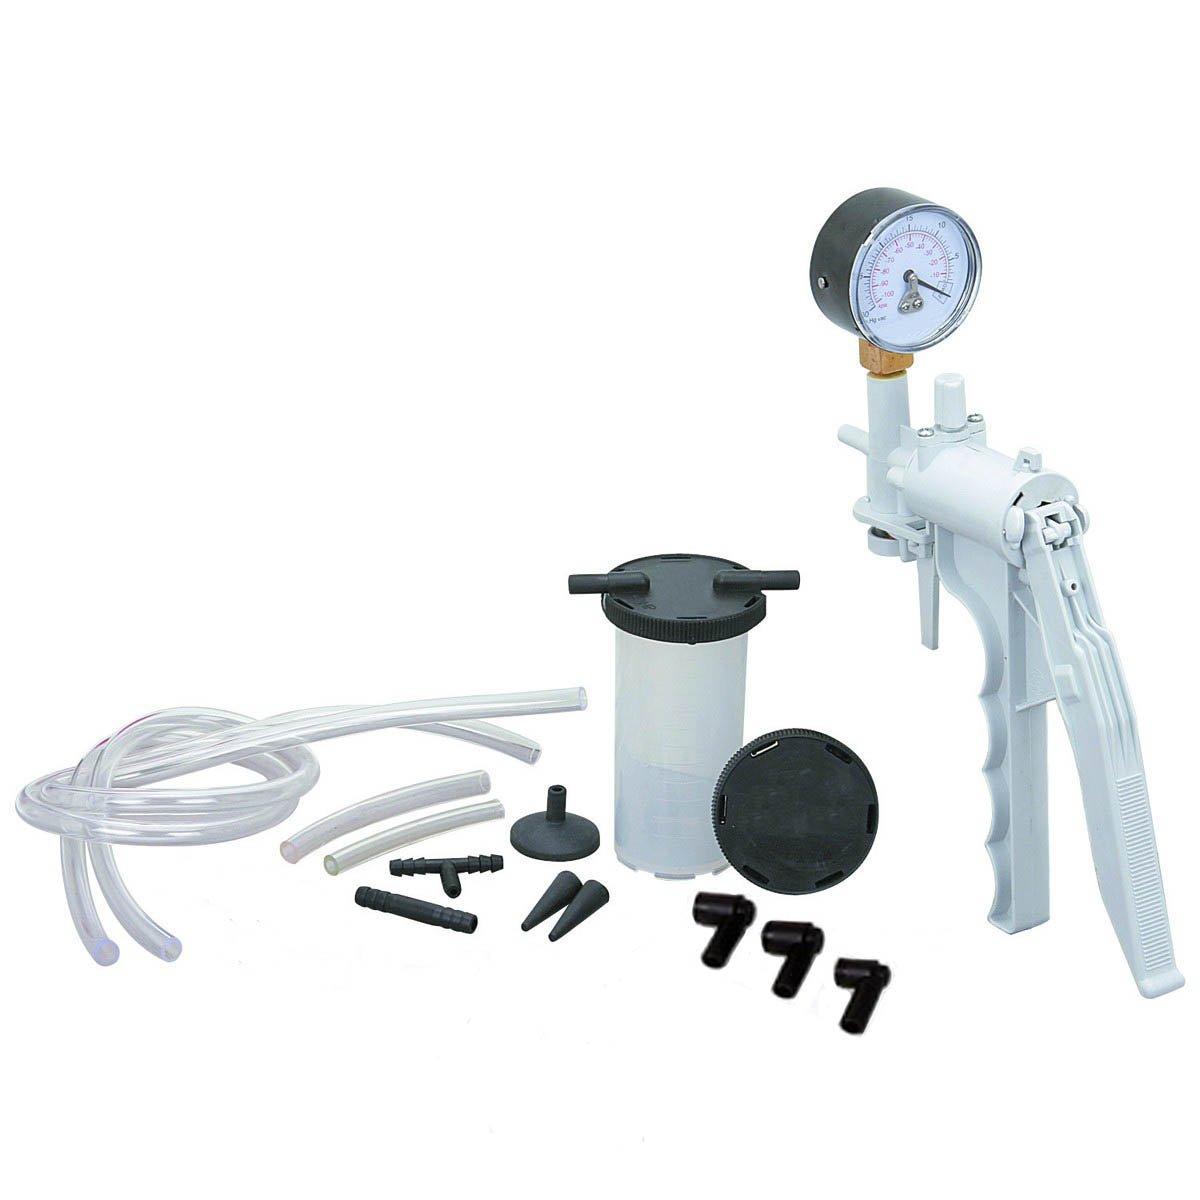 Brake Fluid Bleeder Hand Vacuum Pump Tester Kit w/ Adapters Case PMD Products 2002B